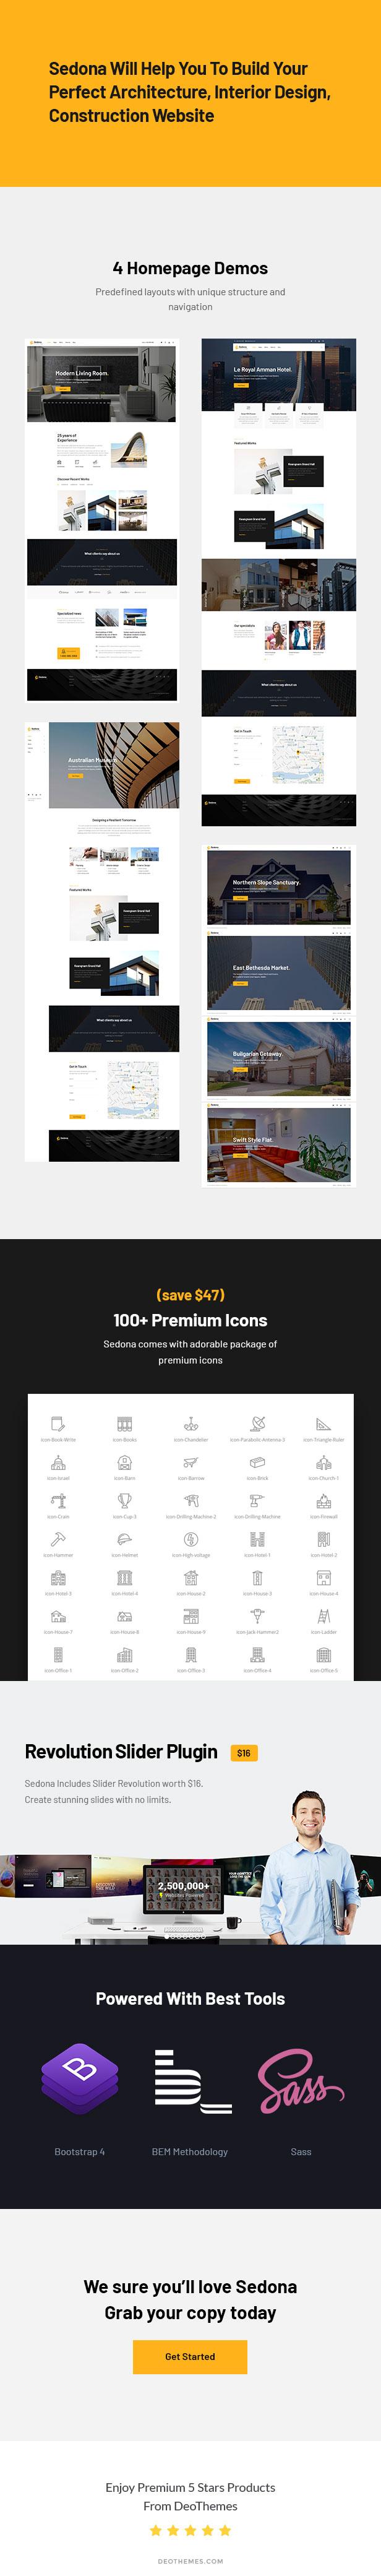 Sedona | Architecture & Construction HTML Template - 2